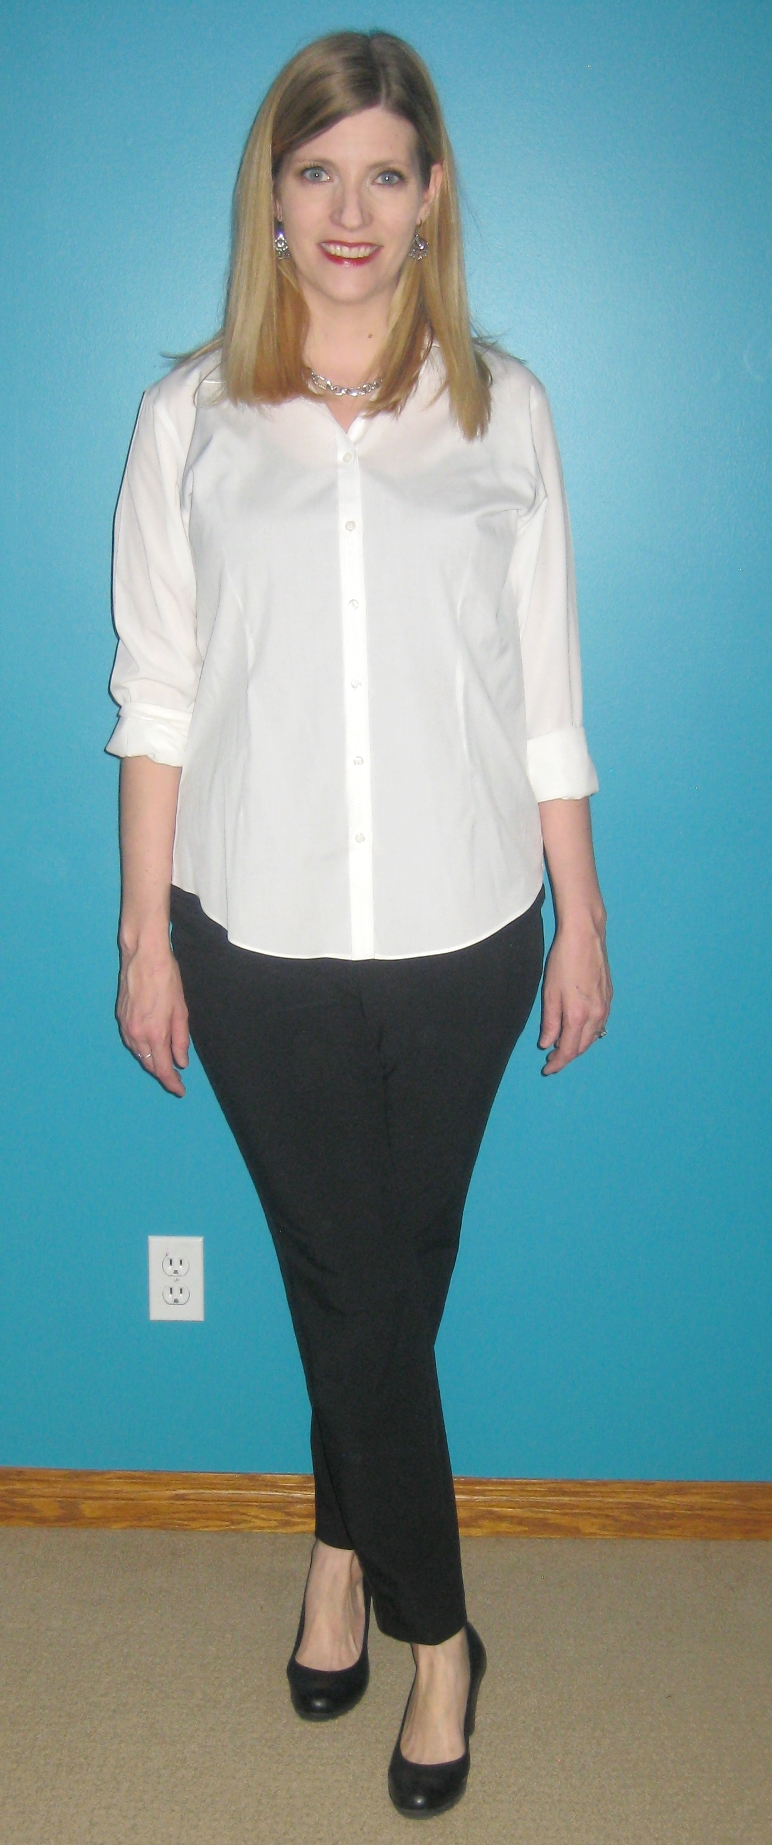 White Top And Black Pants - Pant Row